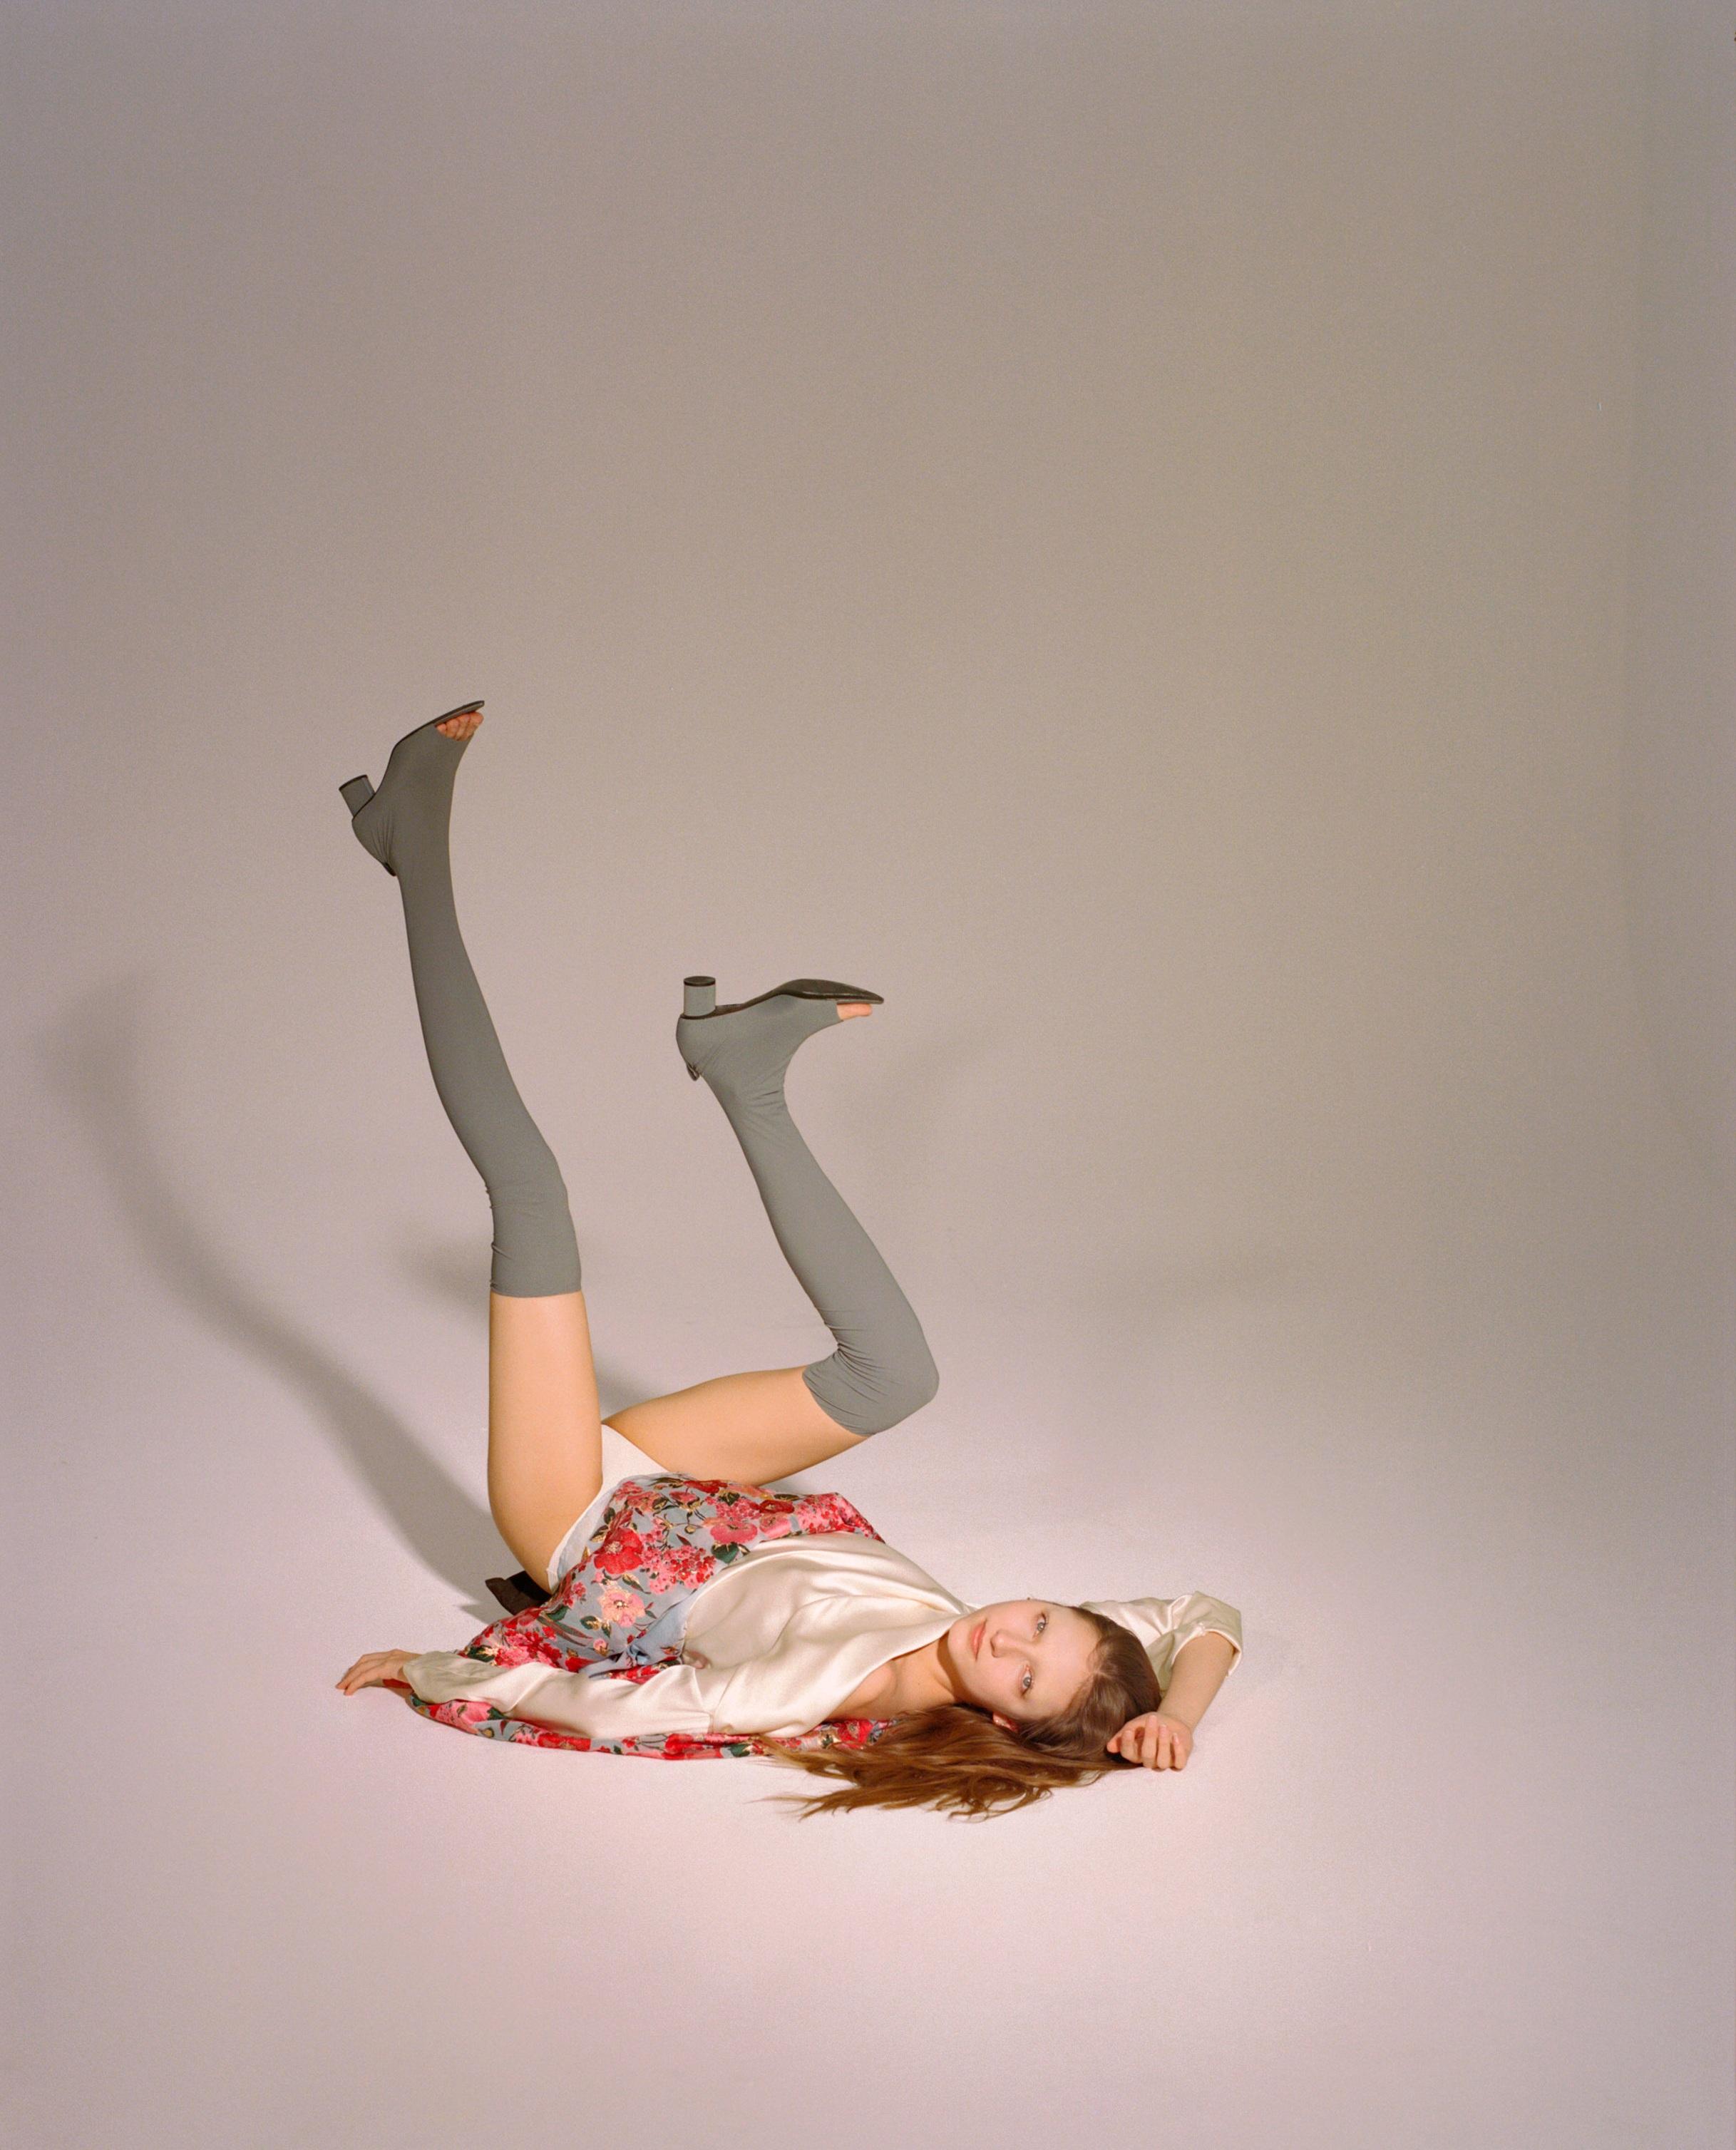 Bodysuit  ALIX  Dress  MUSED  Boots  JIL SANDER